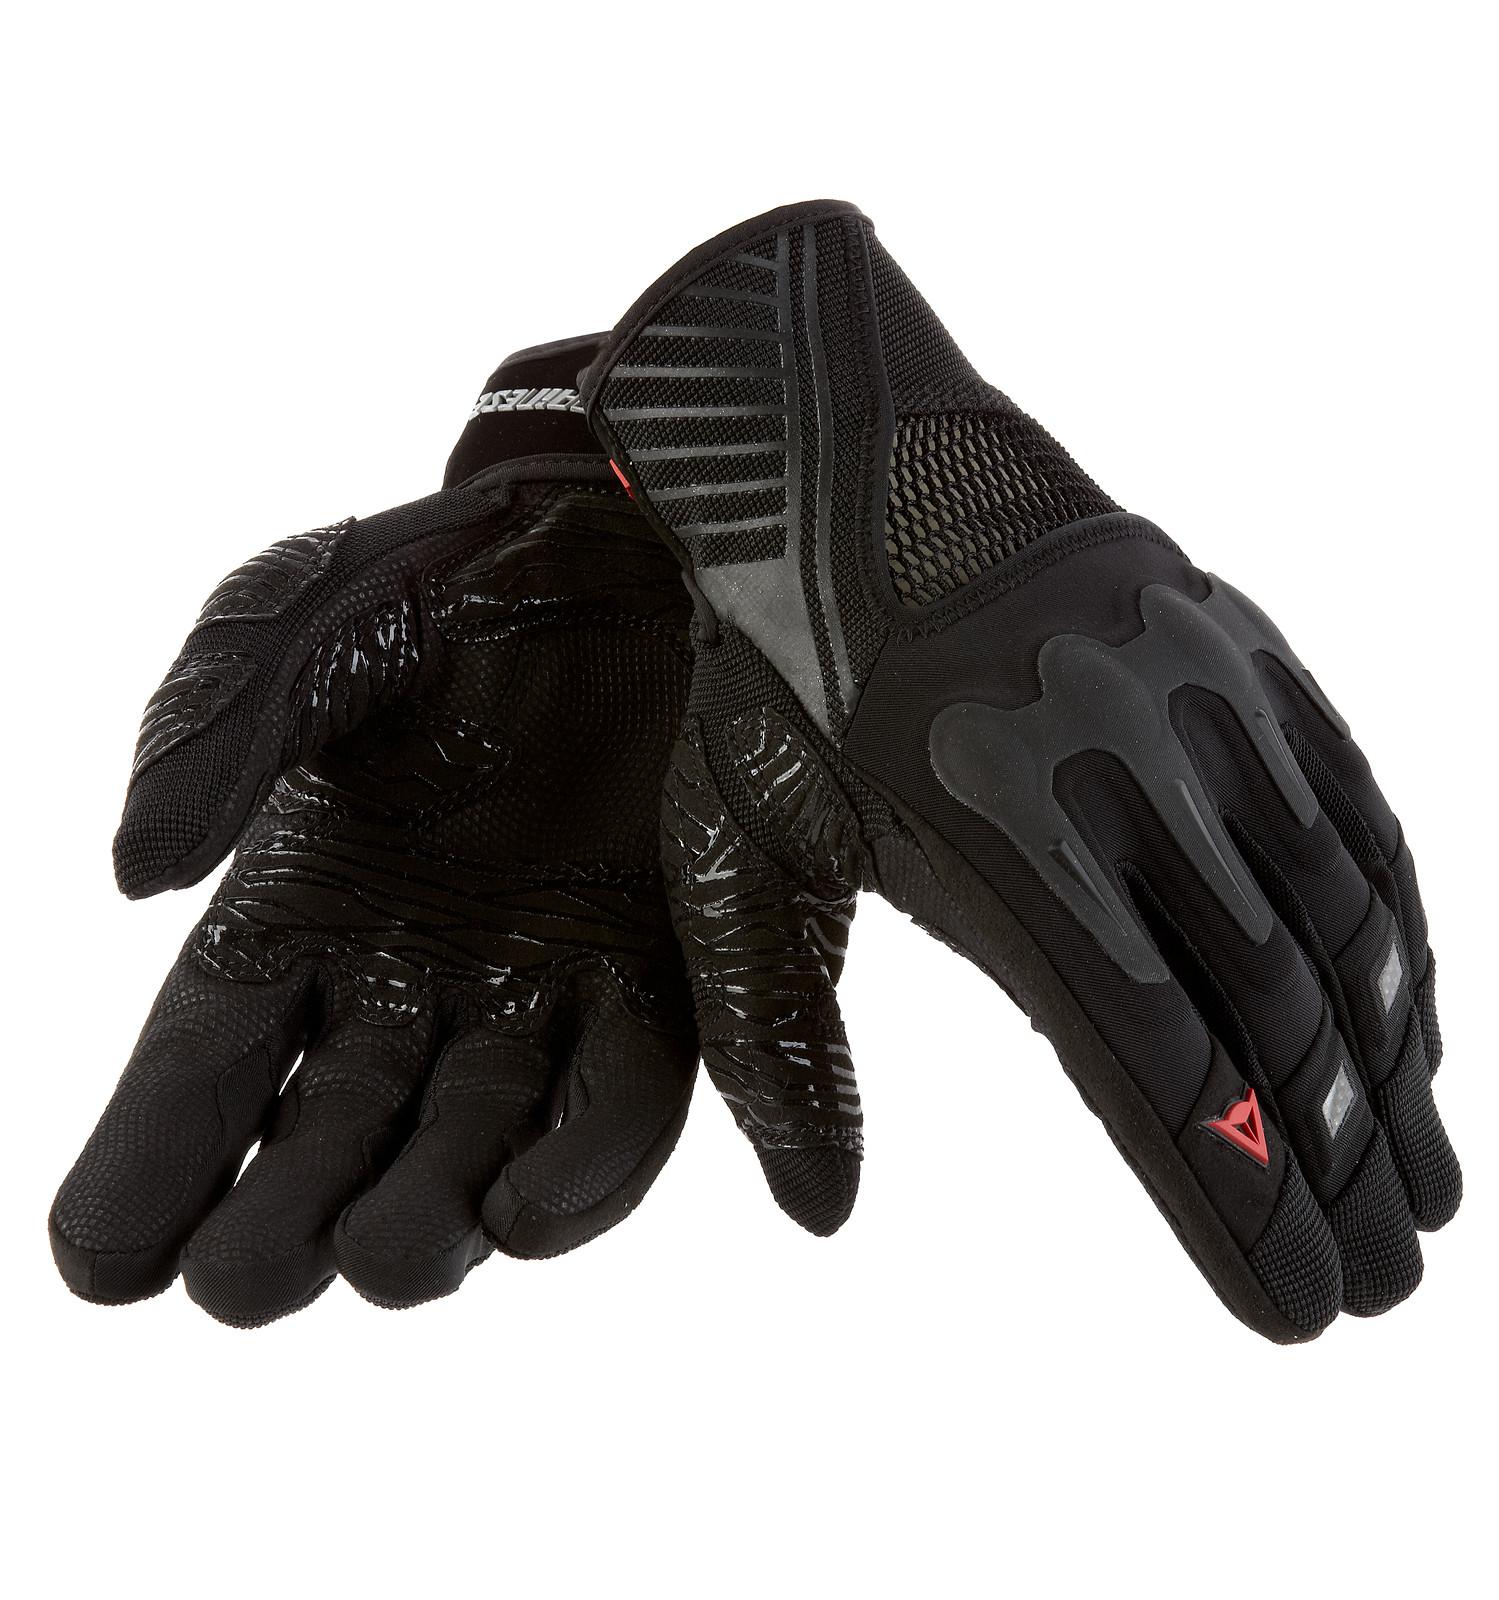 Atrax Gloves Long